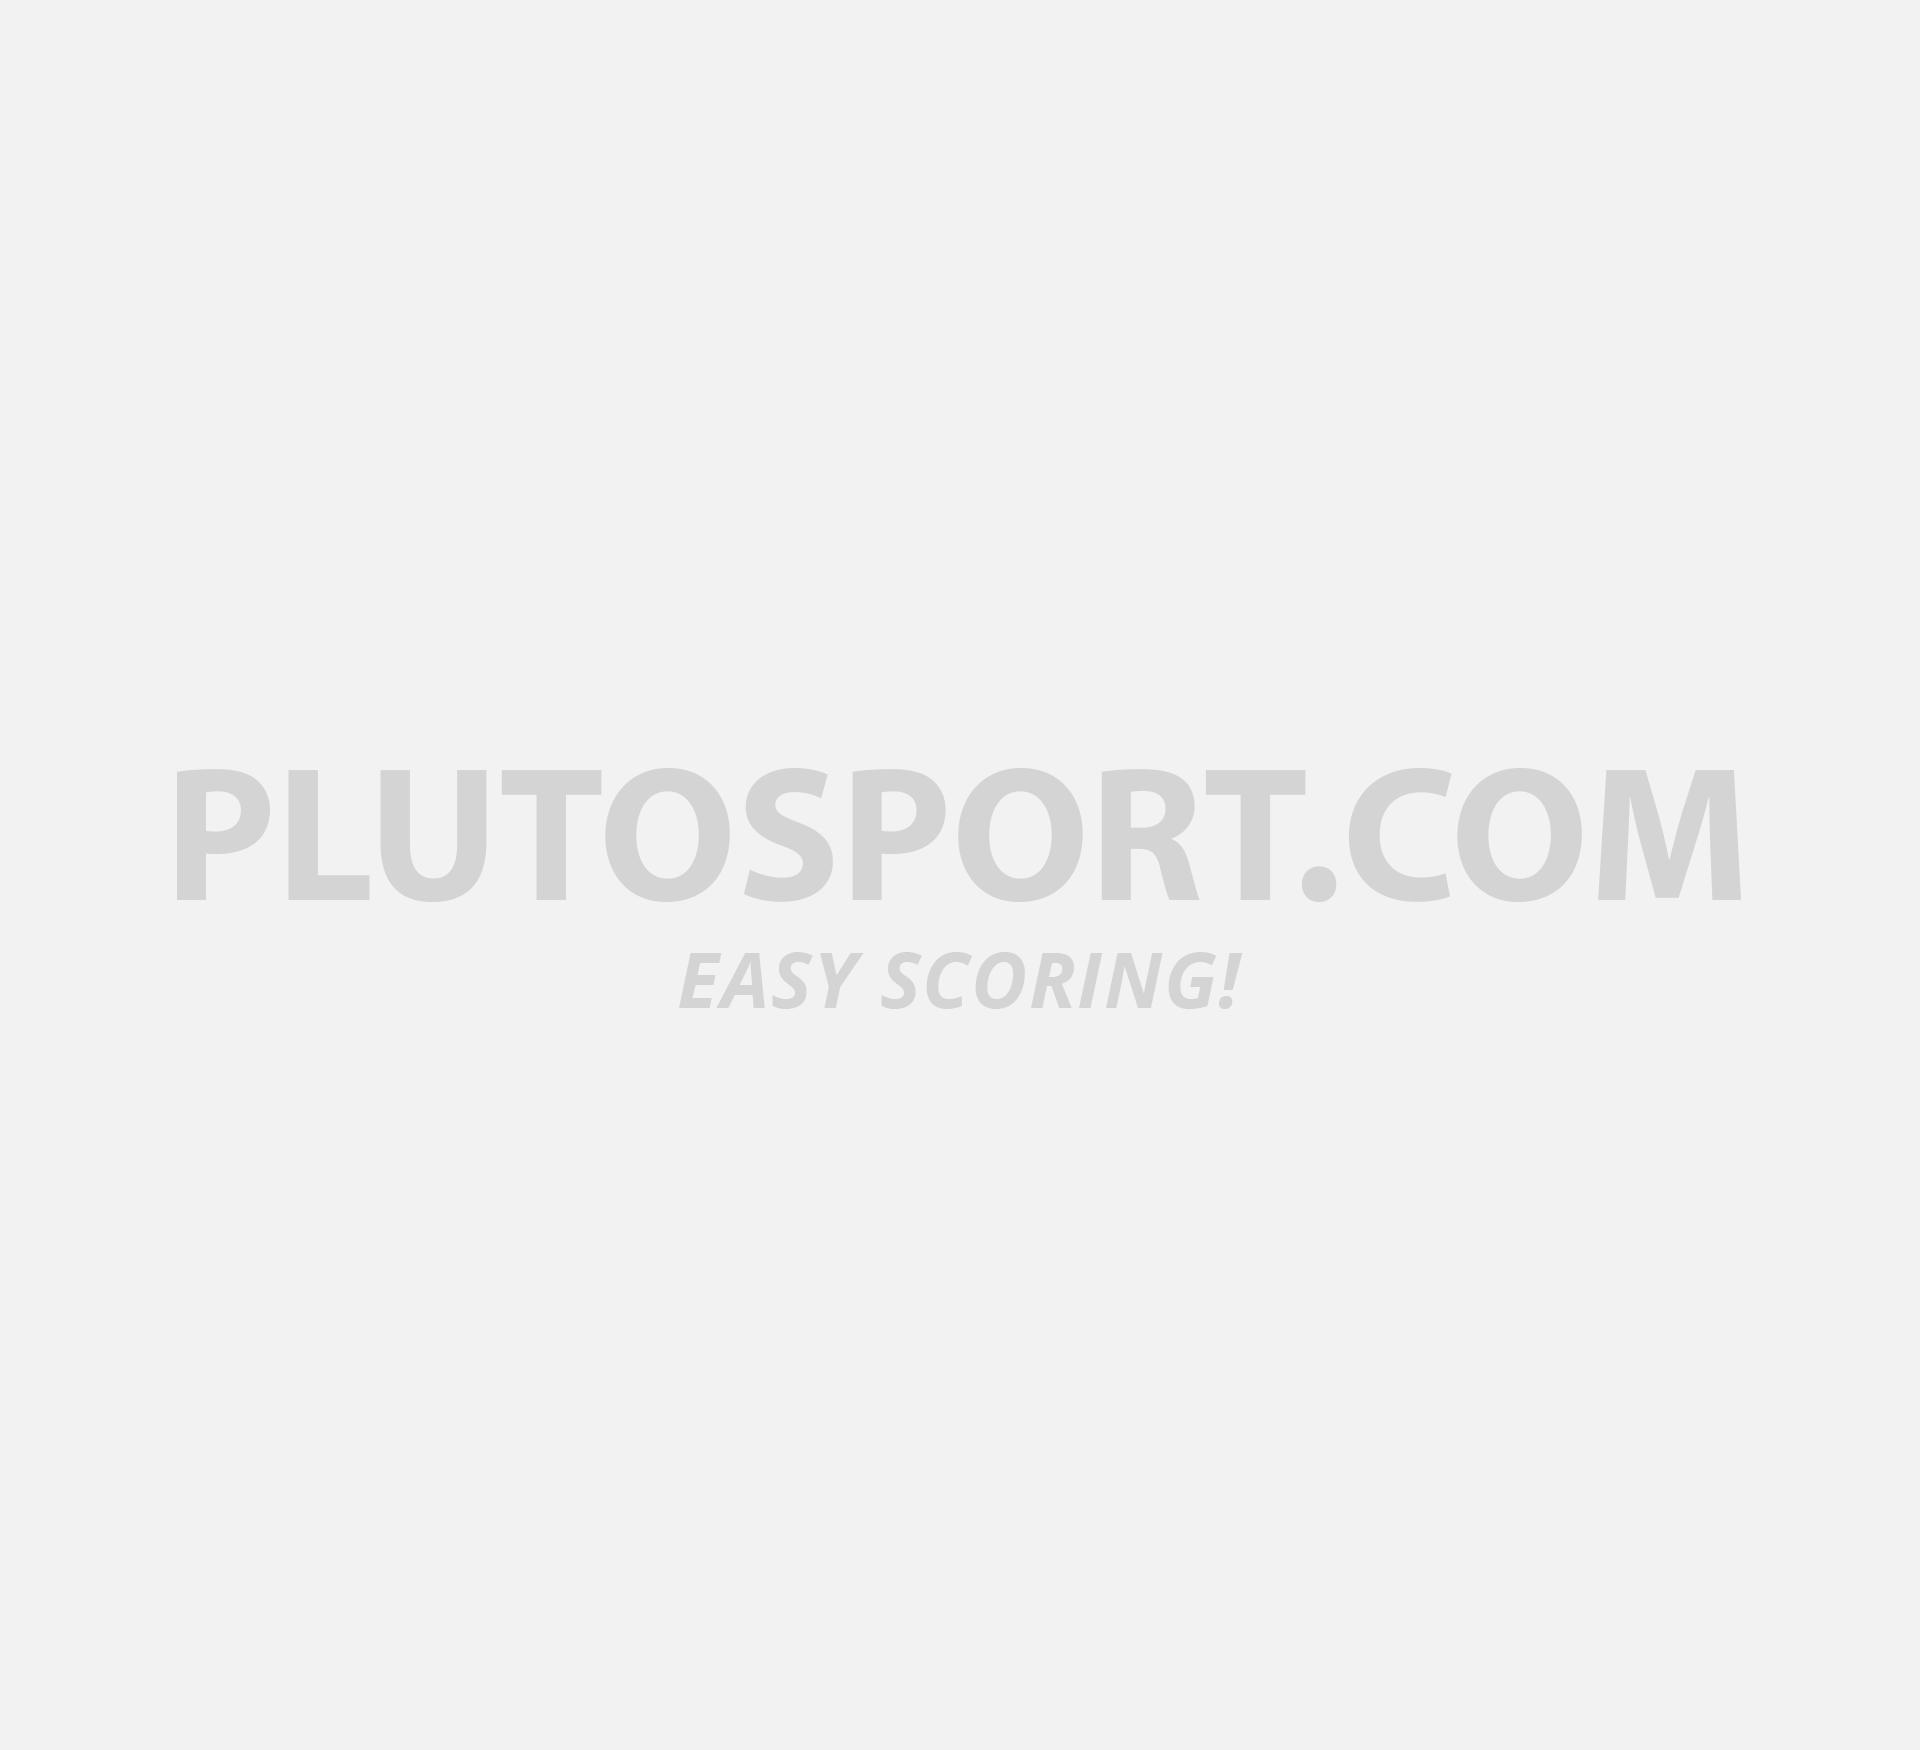 6bbd846f02 Roxy Snowstorm Snowboard Jacket - Winter jackets - Jackets - Clothing -  Lifestyle - Sports | Plutosport